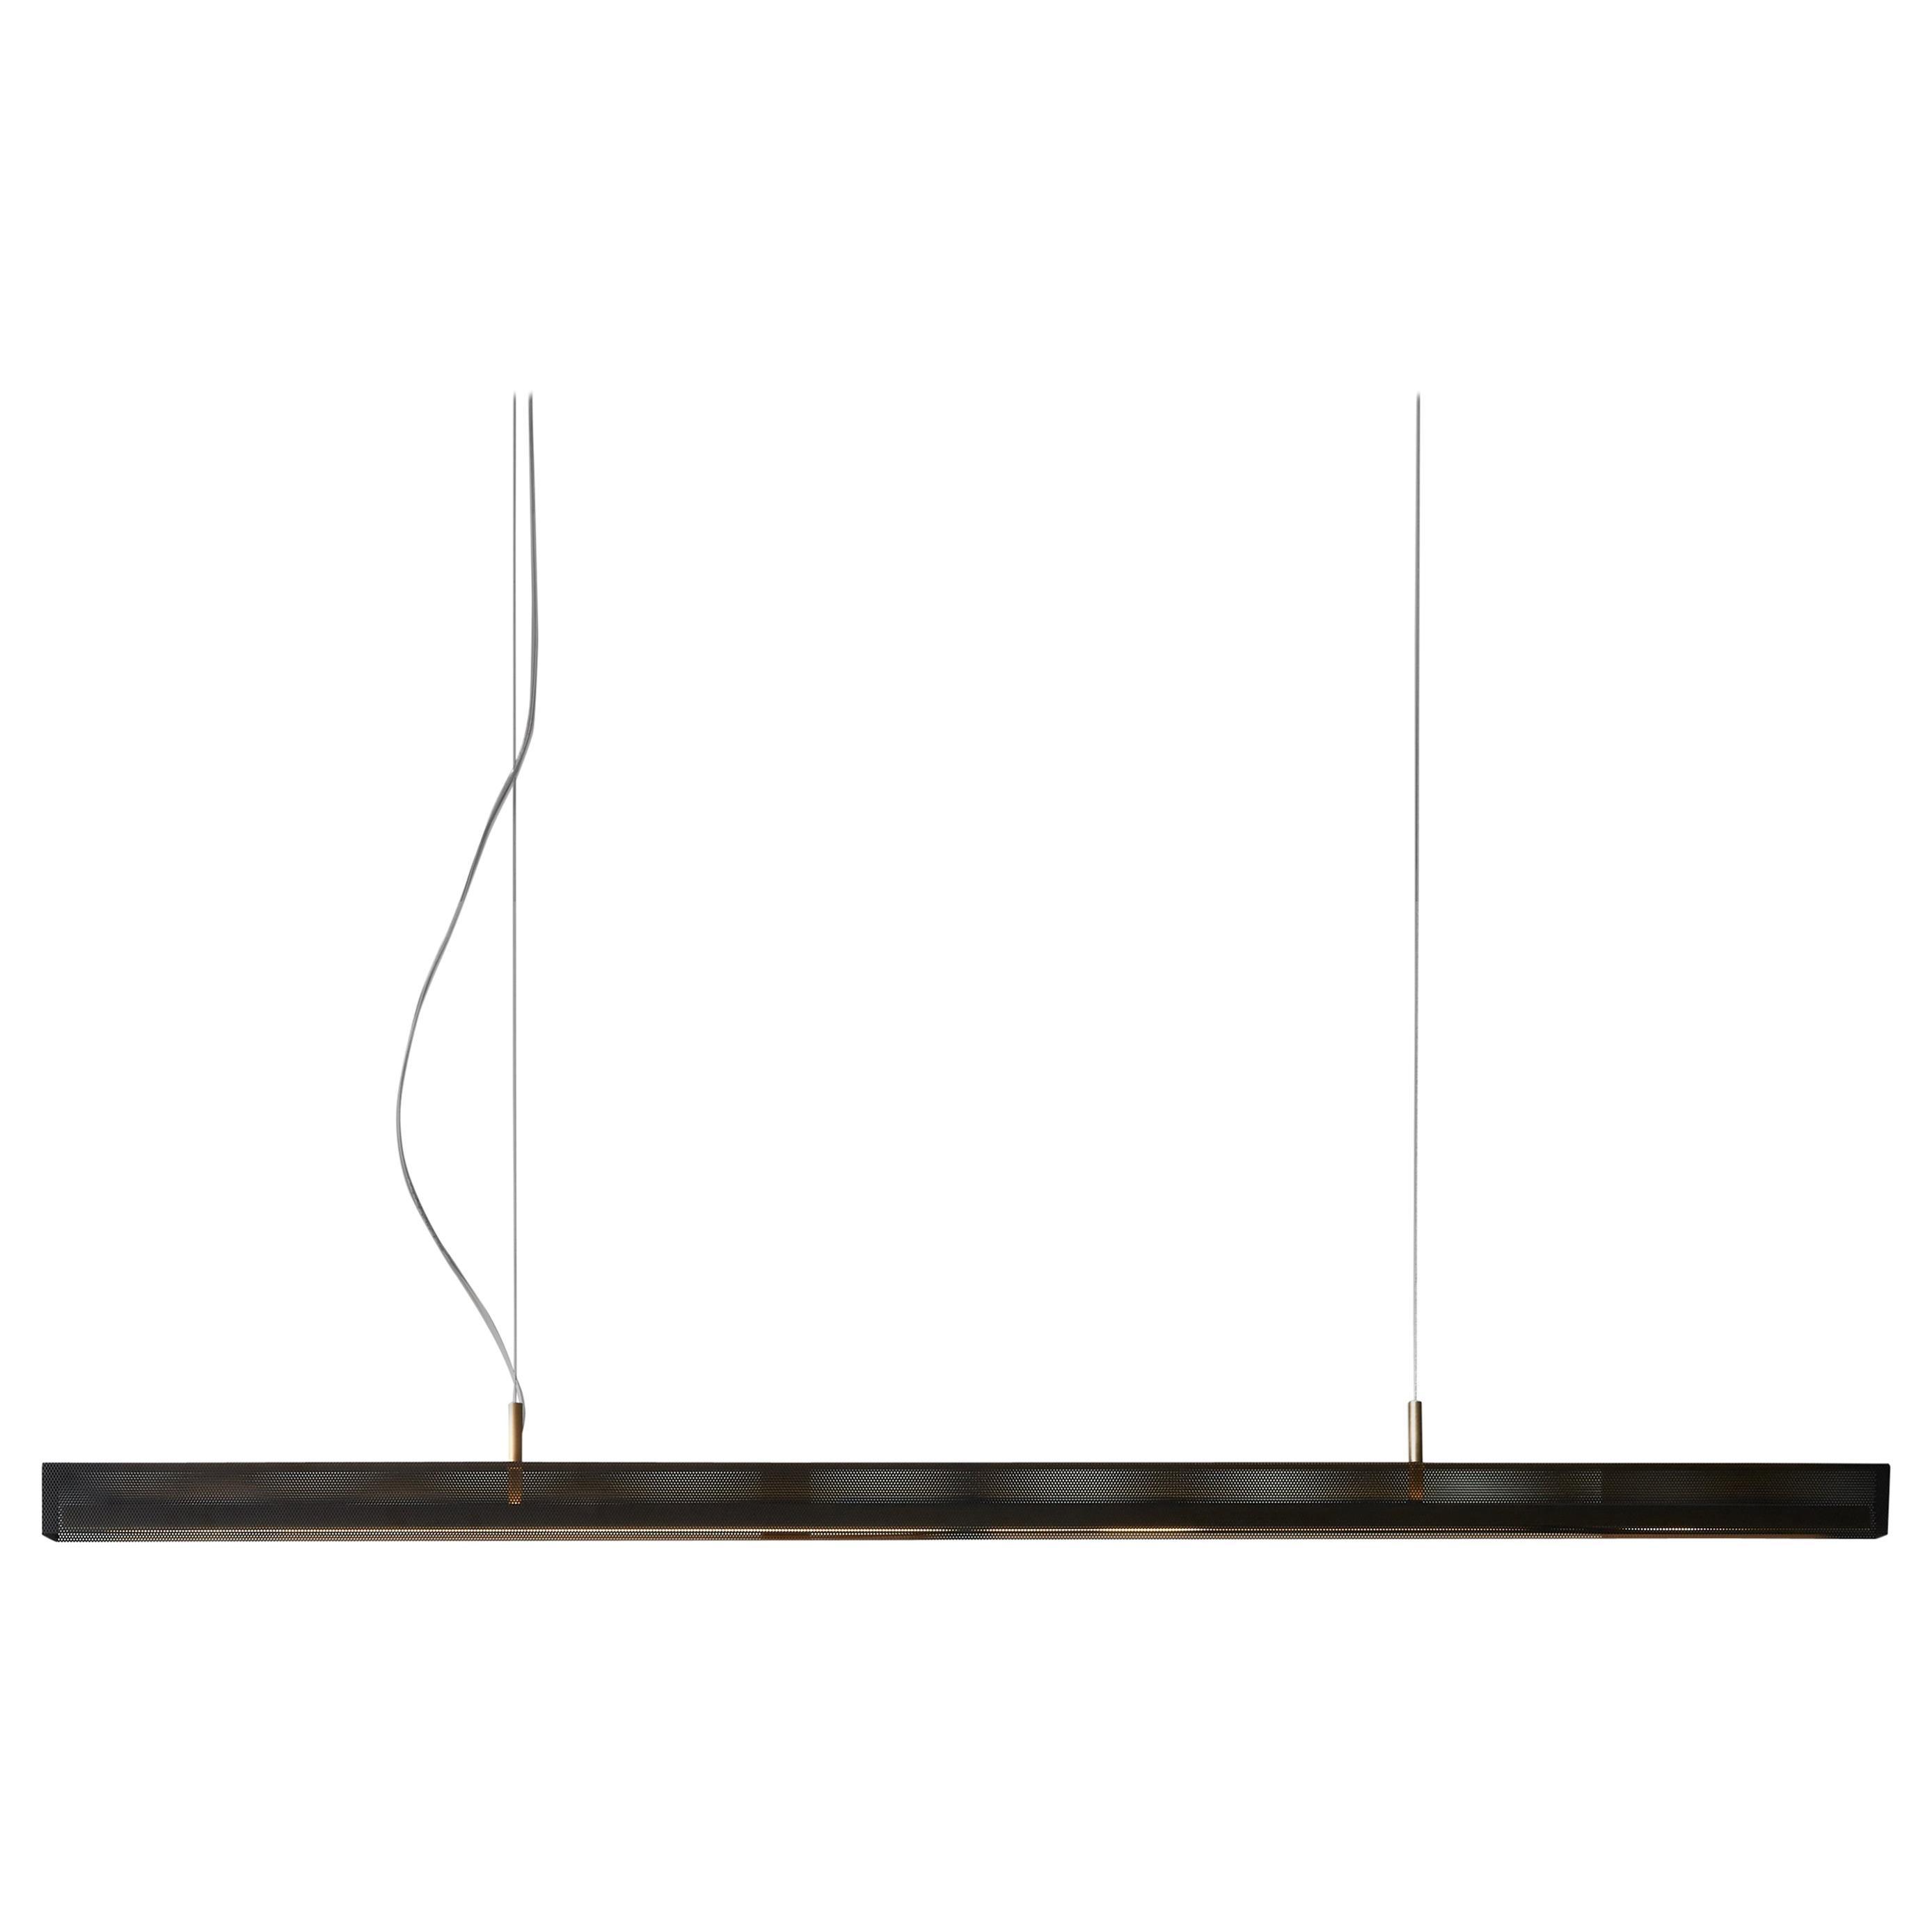 VeniceM Urban Lightline Susp, Light Burnished Brass and Metal by Massimo Tonetto